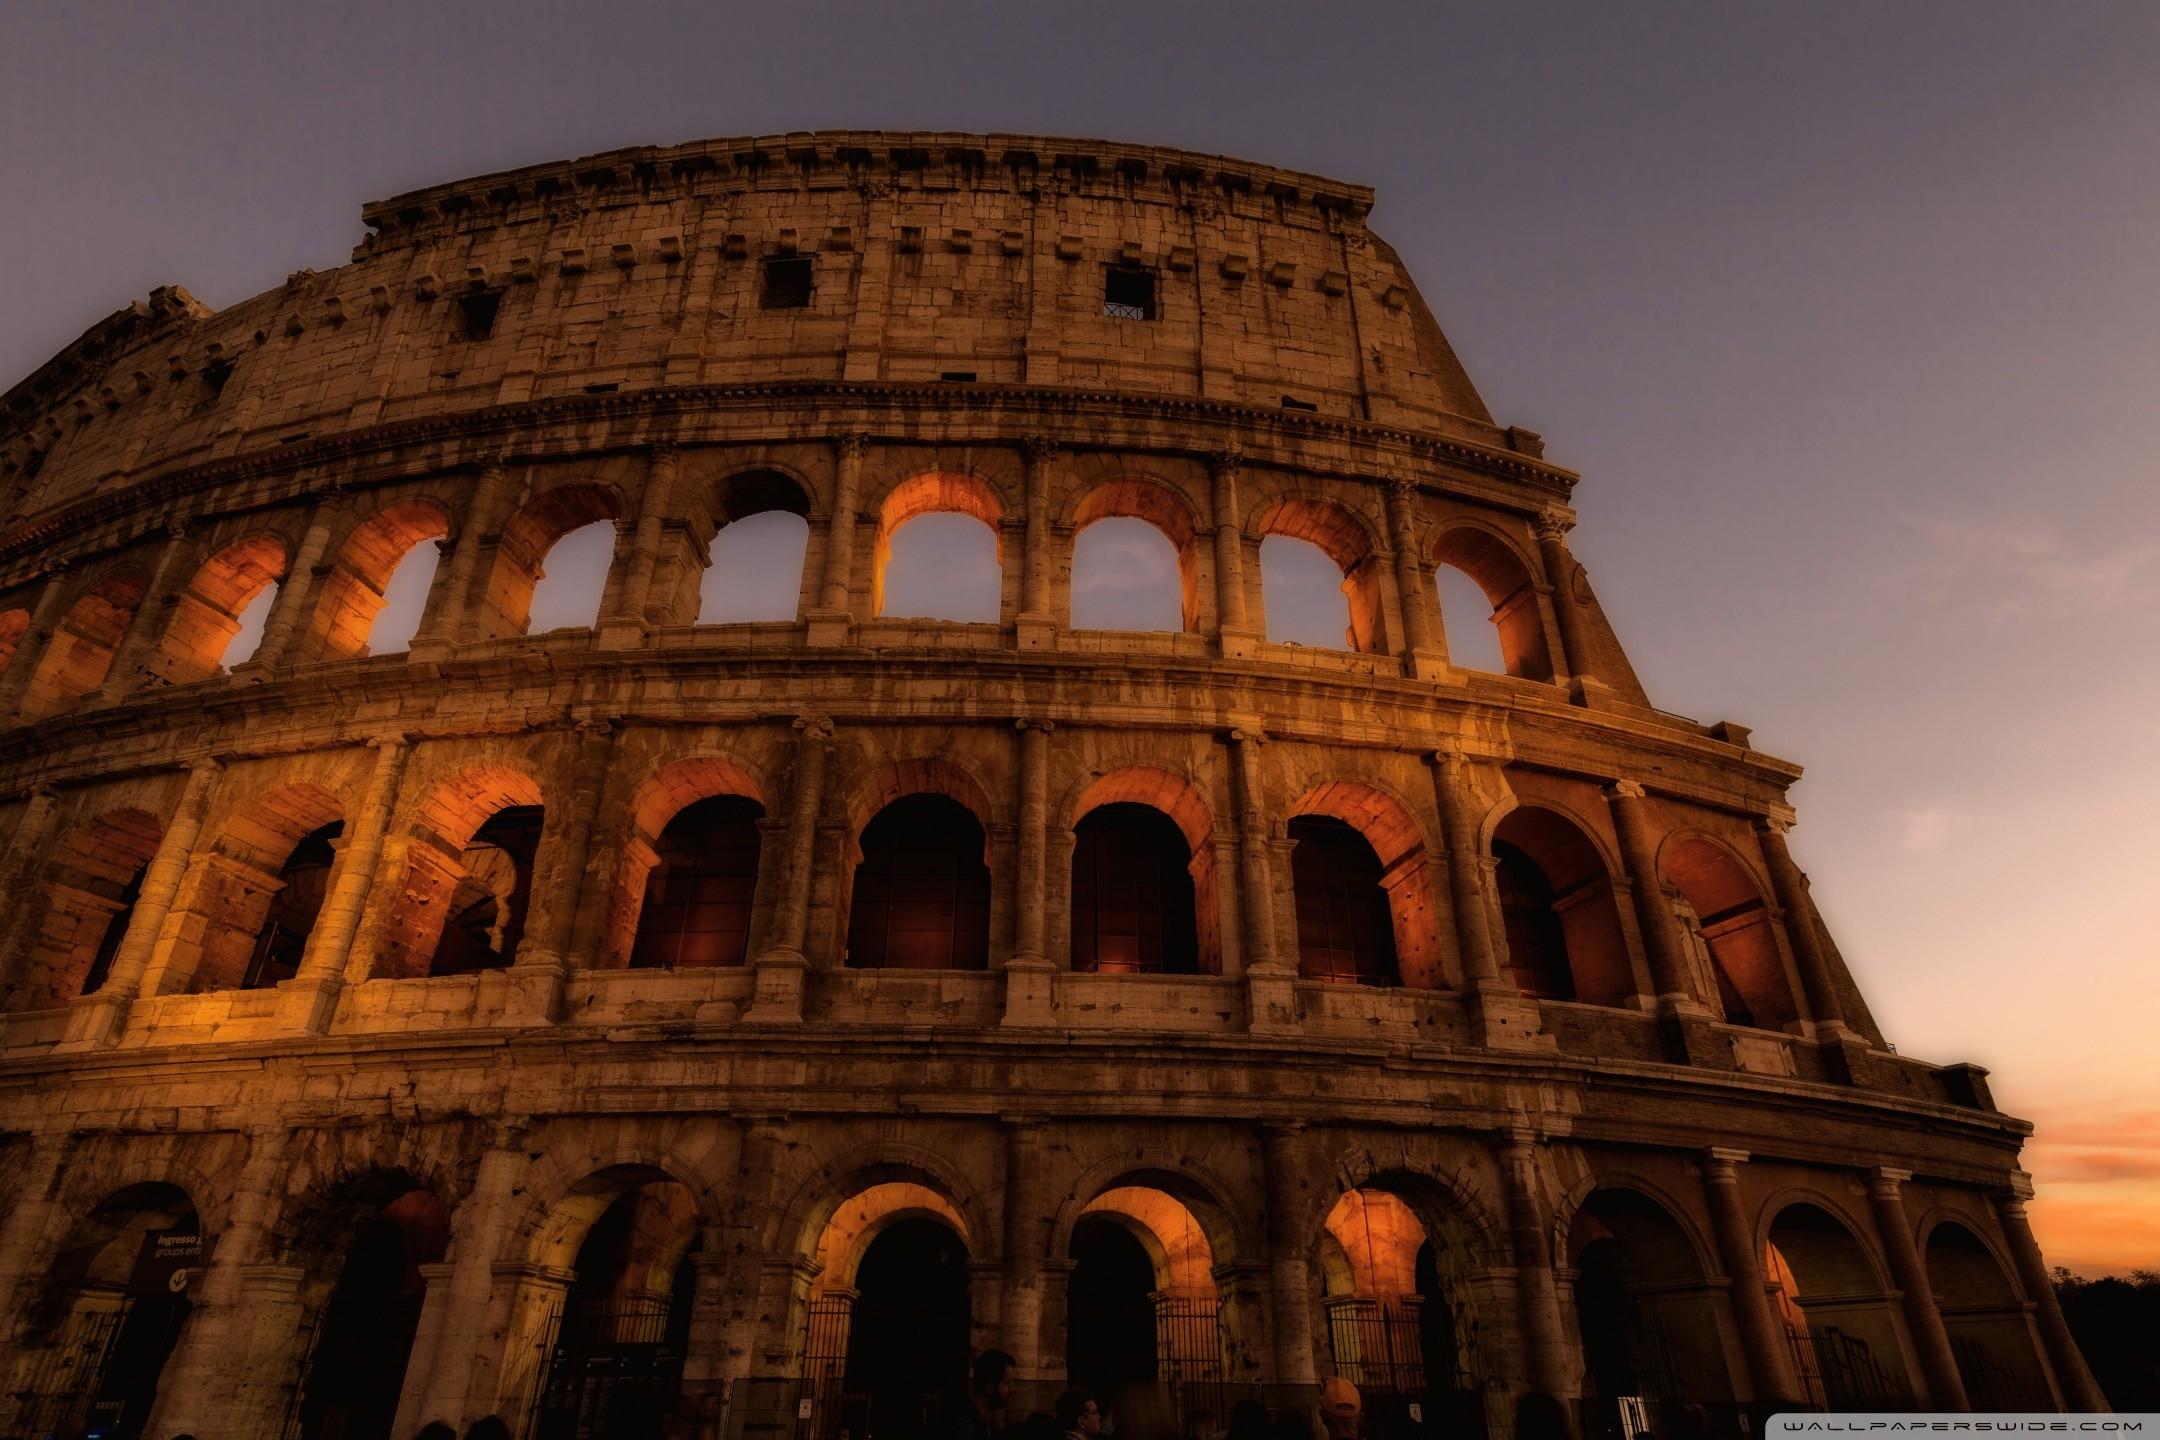 Colosseum Wallpaper (68+ Images